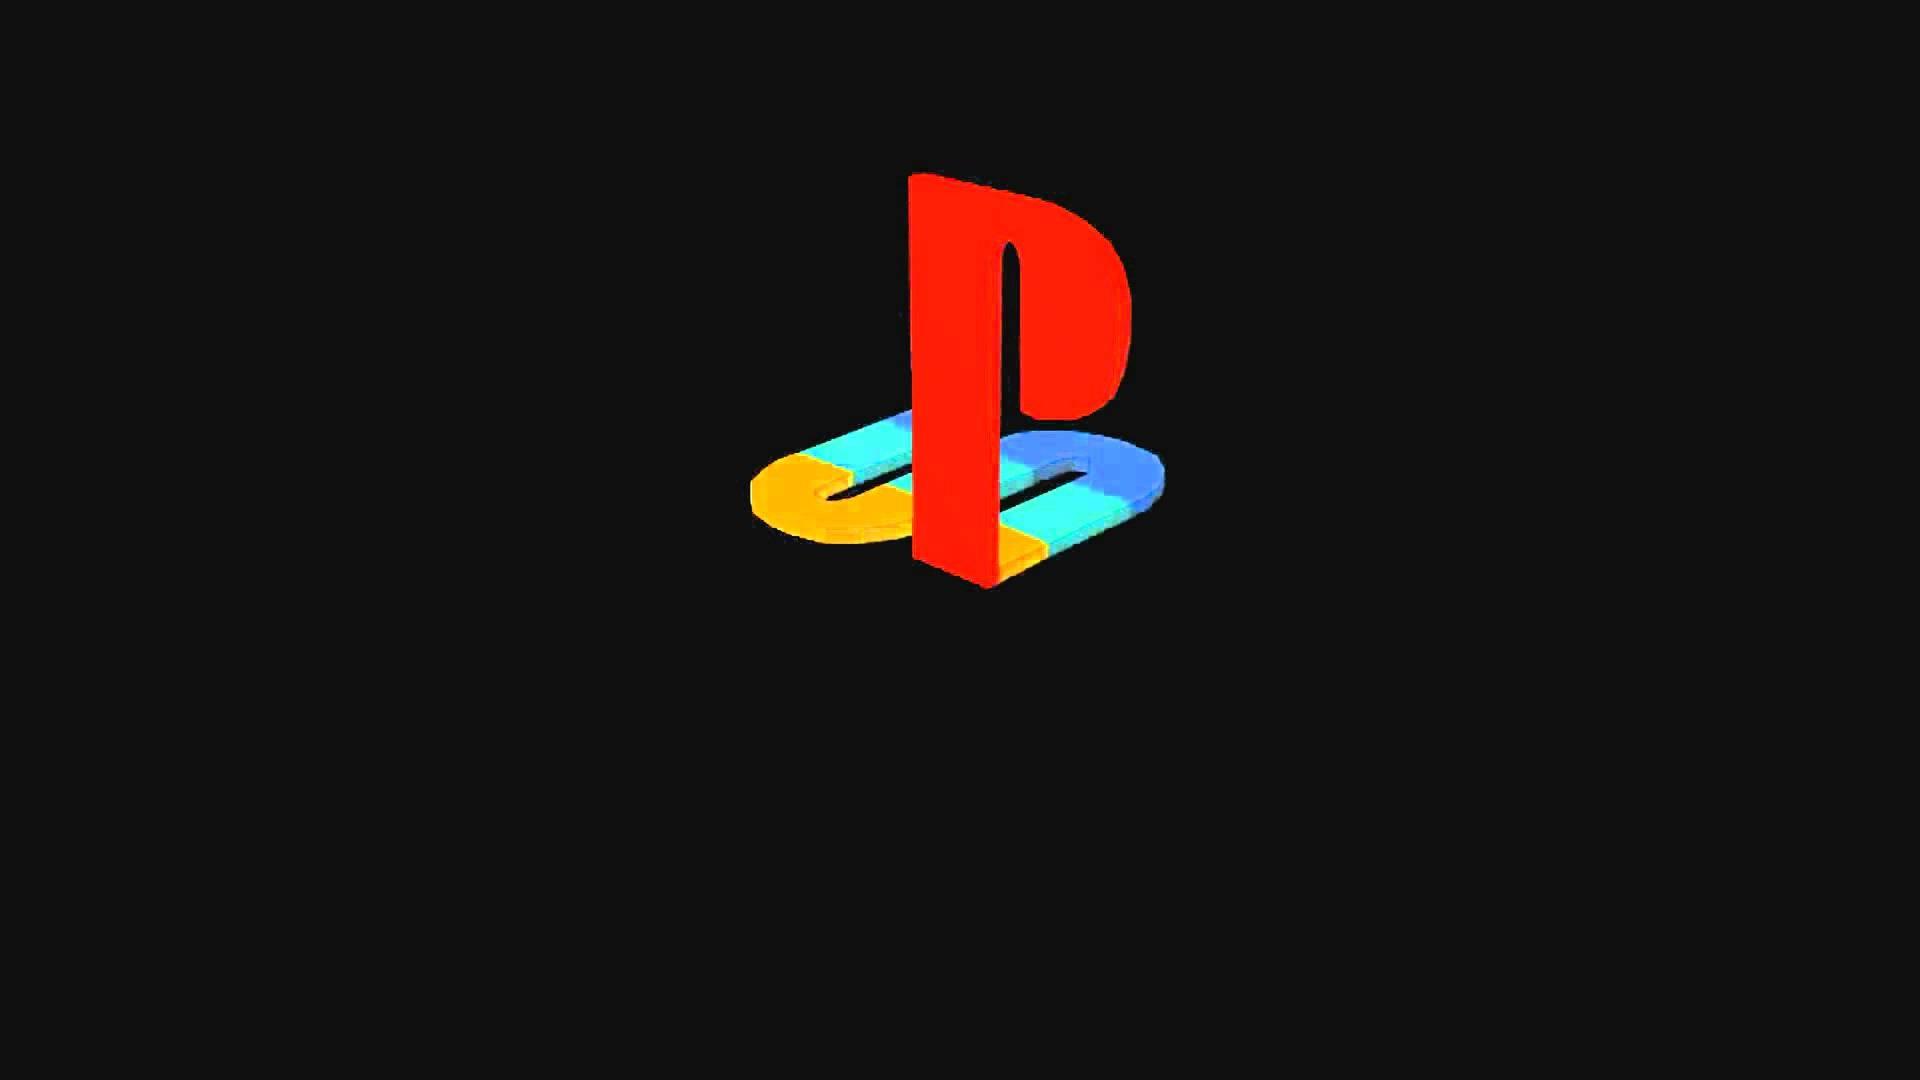 Playstation Logo Wallpaper (77+ images)